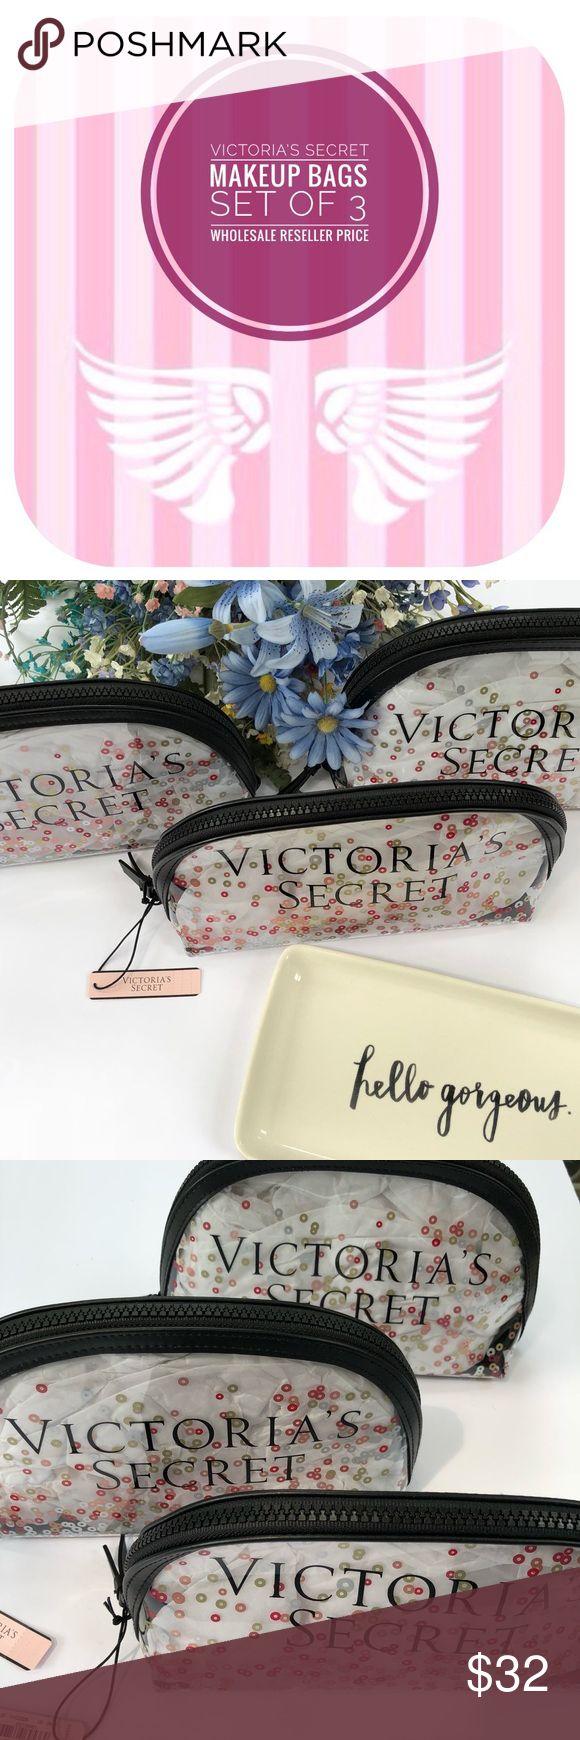 WHOLESALE! (3) Victoria's Secret ZIP Makeup Bag 3 Victoria